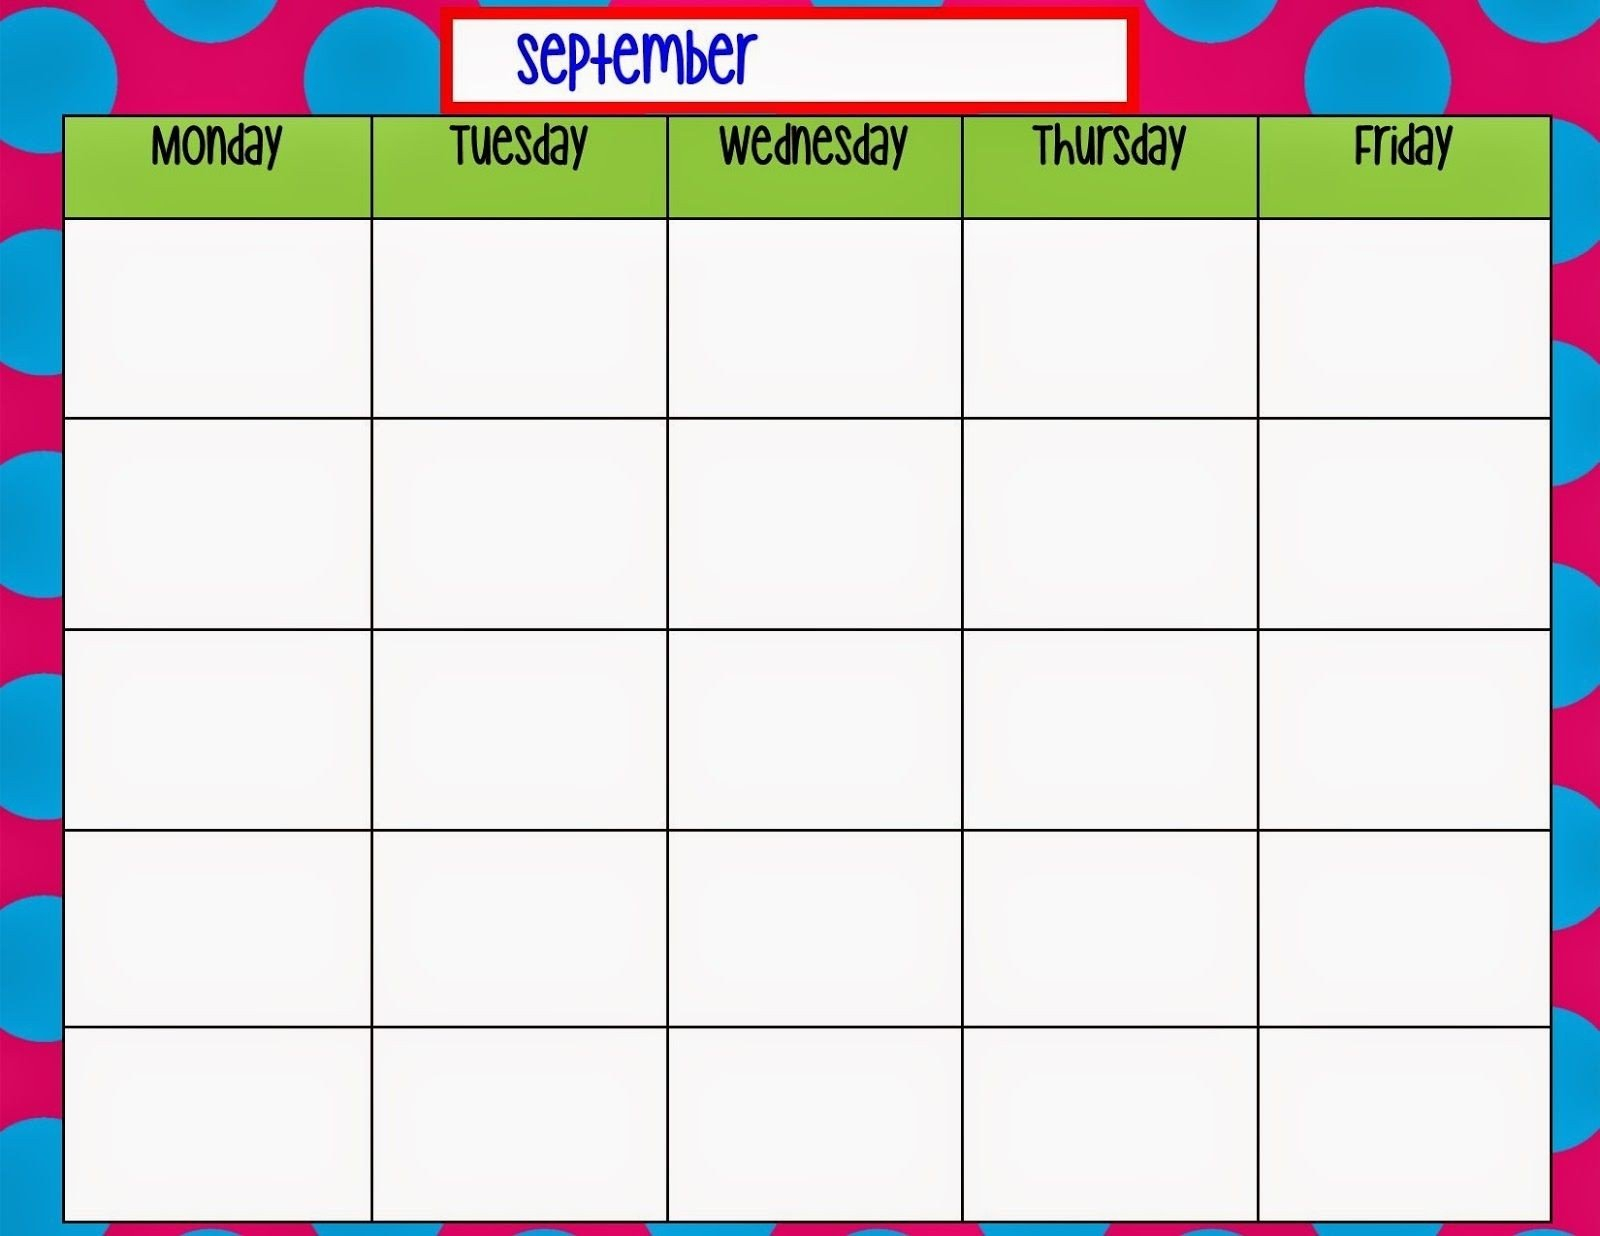 Monthly Calendar Monday To Friday | Calendar Template Monday To Friday Weekly Calendar